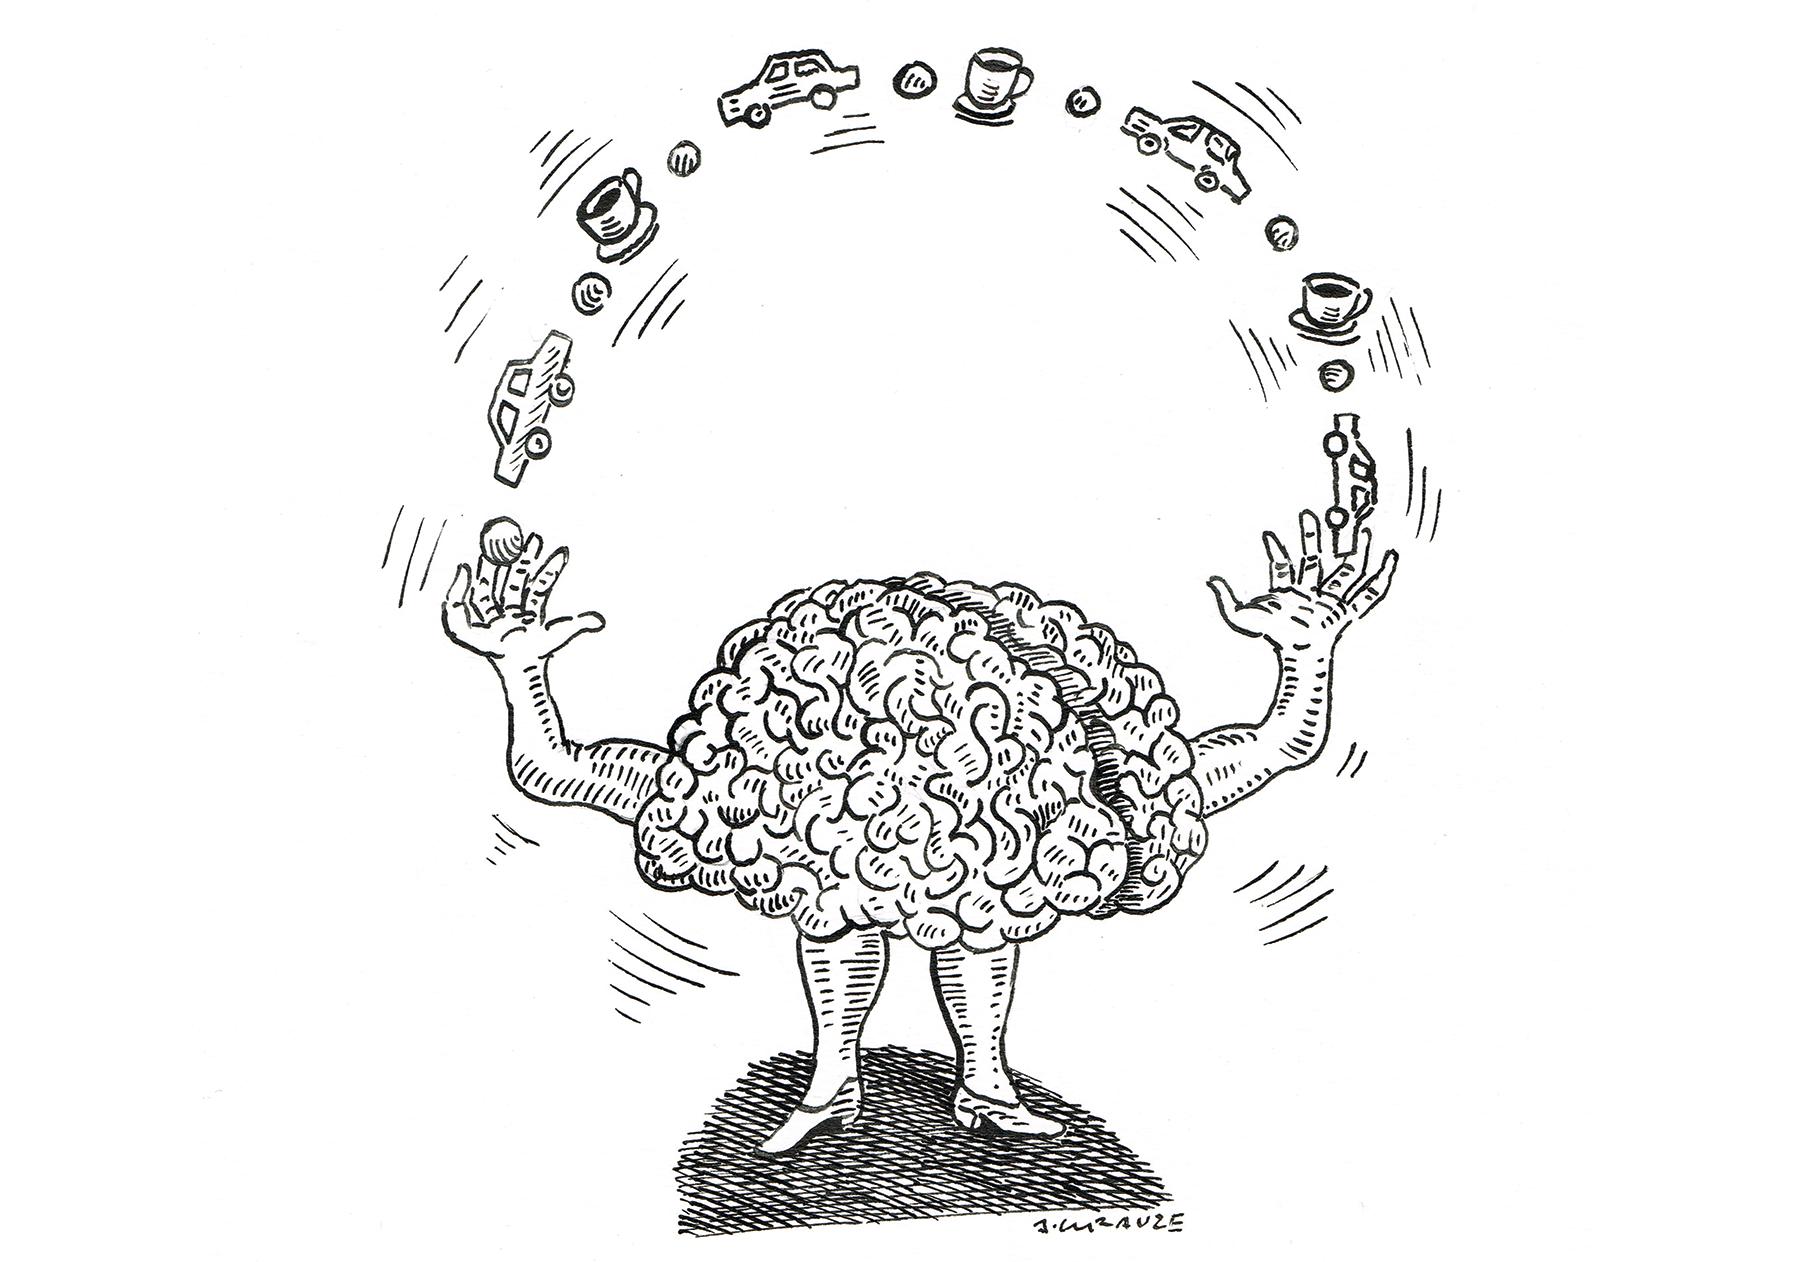 Evolution of the Primate Brain: From Neuron to Behavior (Progress in Brain Research)